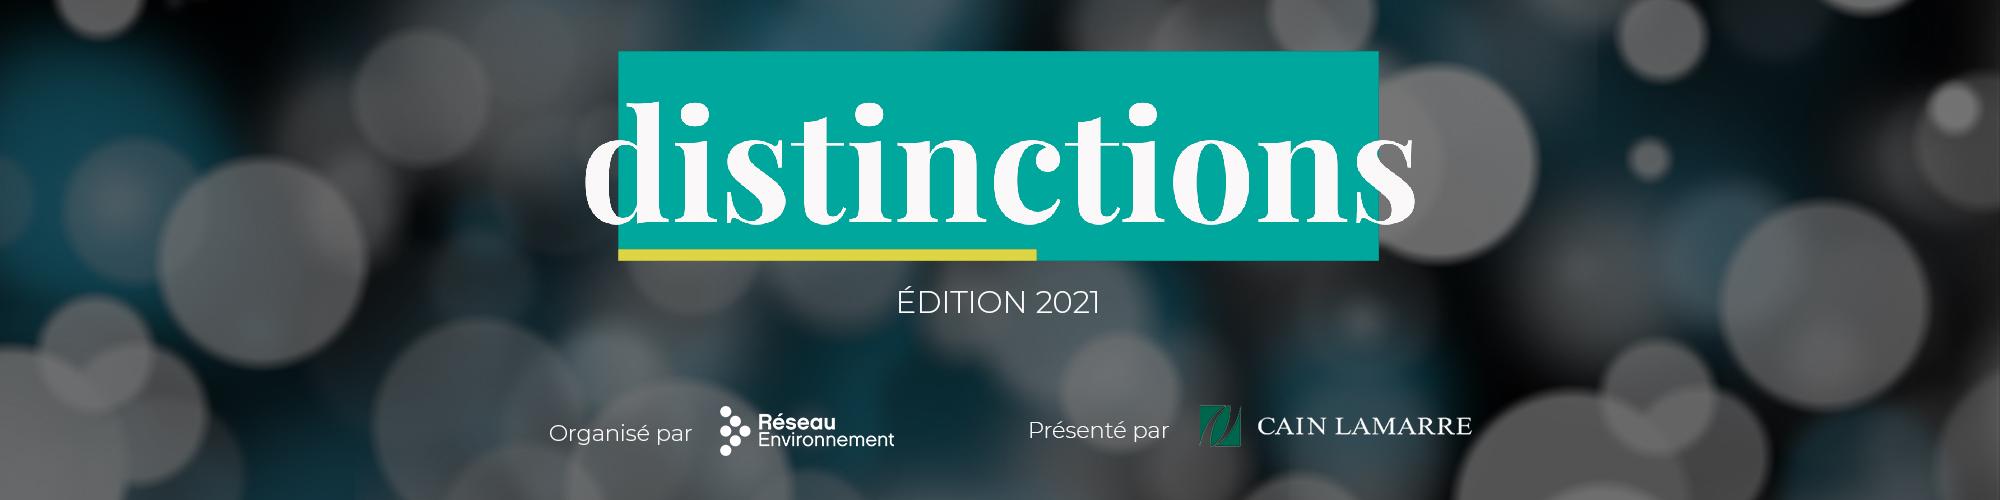 banniere-distinction-2000x500